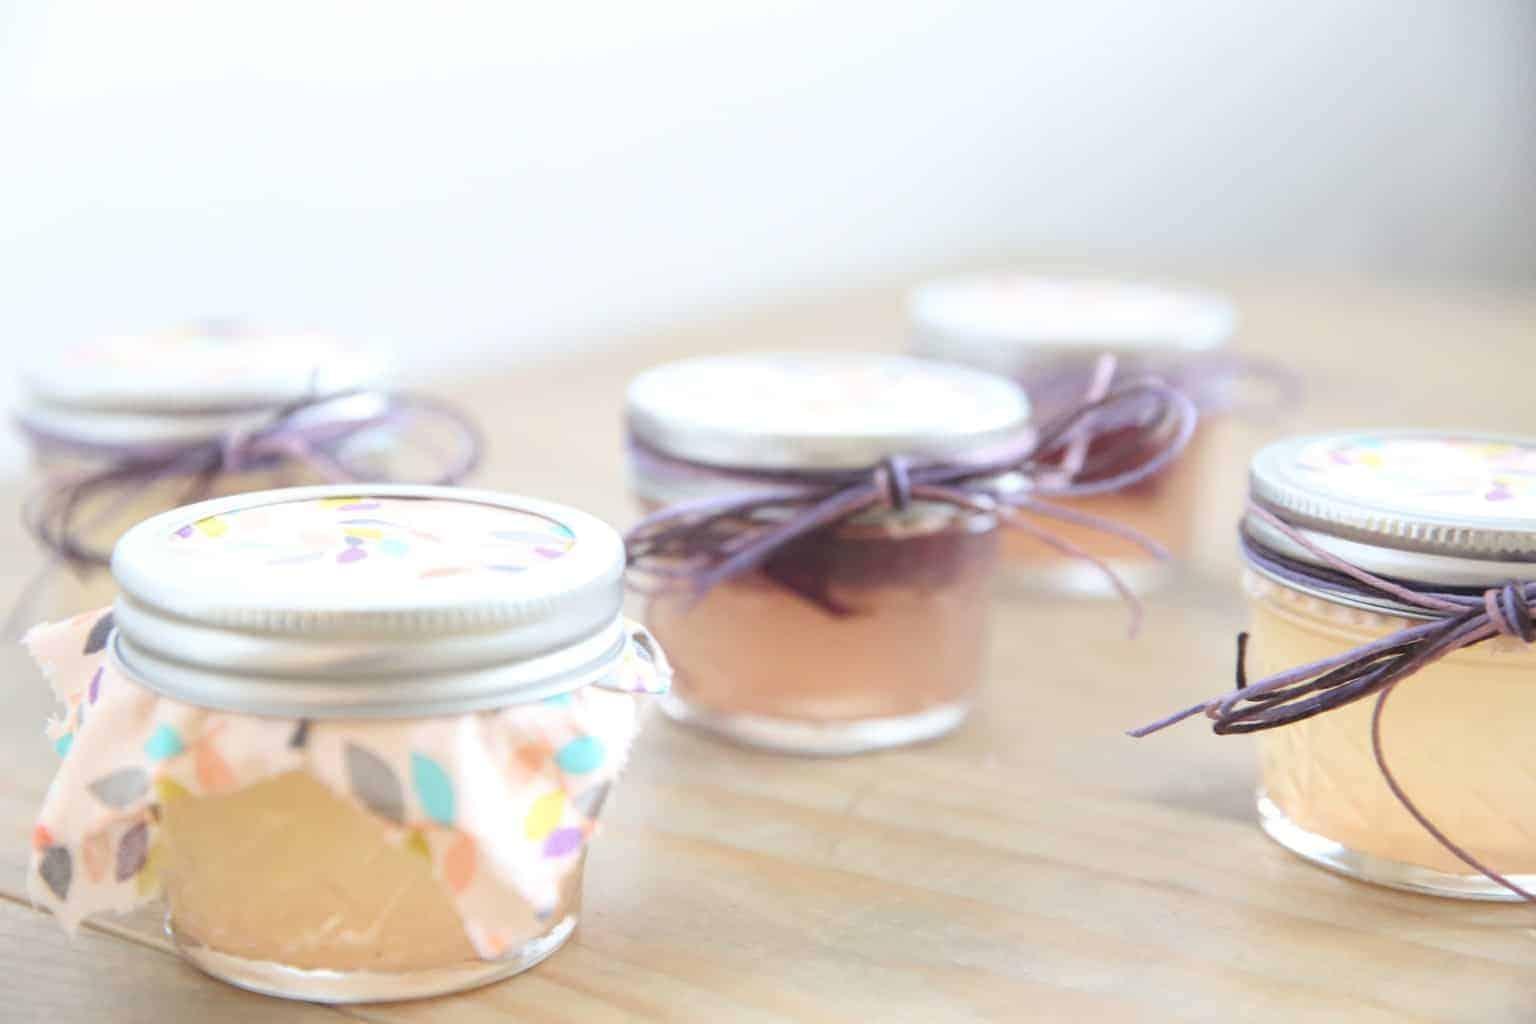 Homemade Gel Air Fresheners in small glass mason jars.